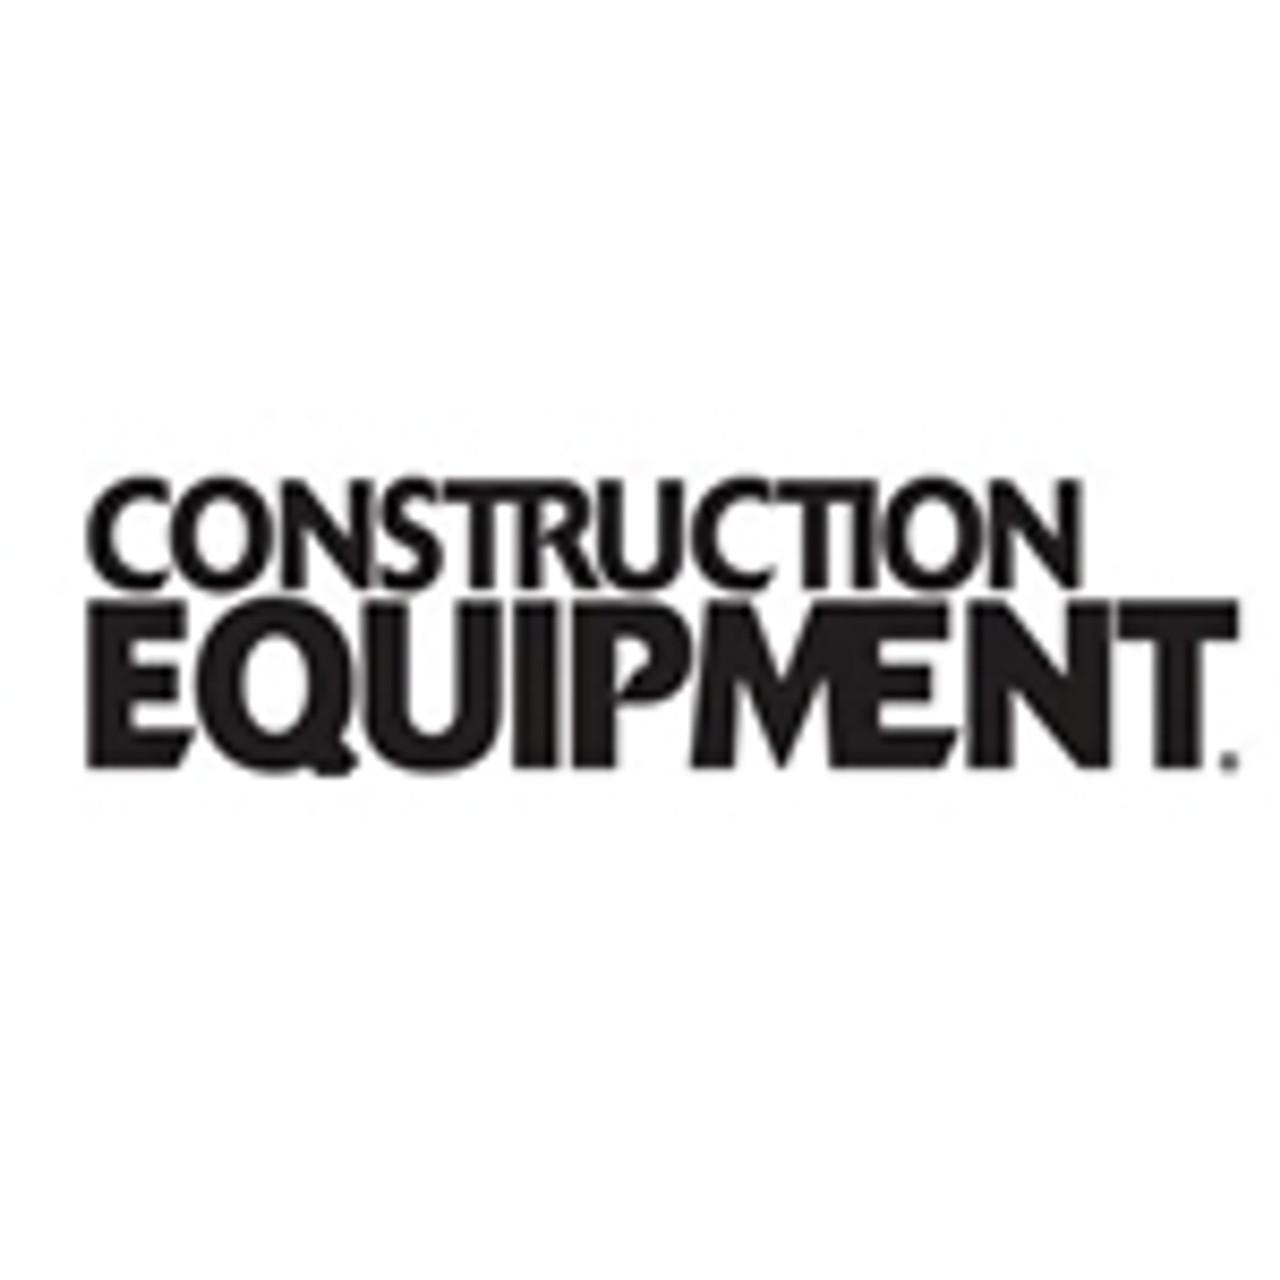 Construction Equipment Co.